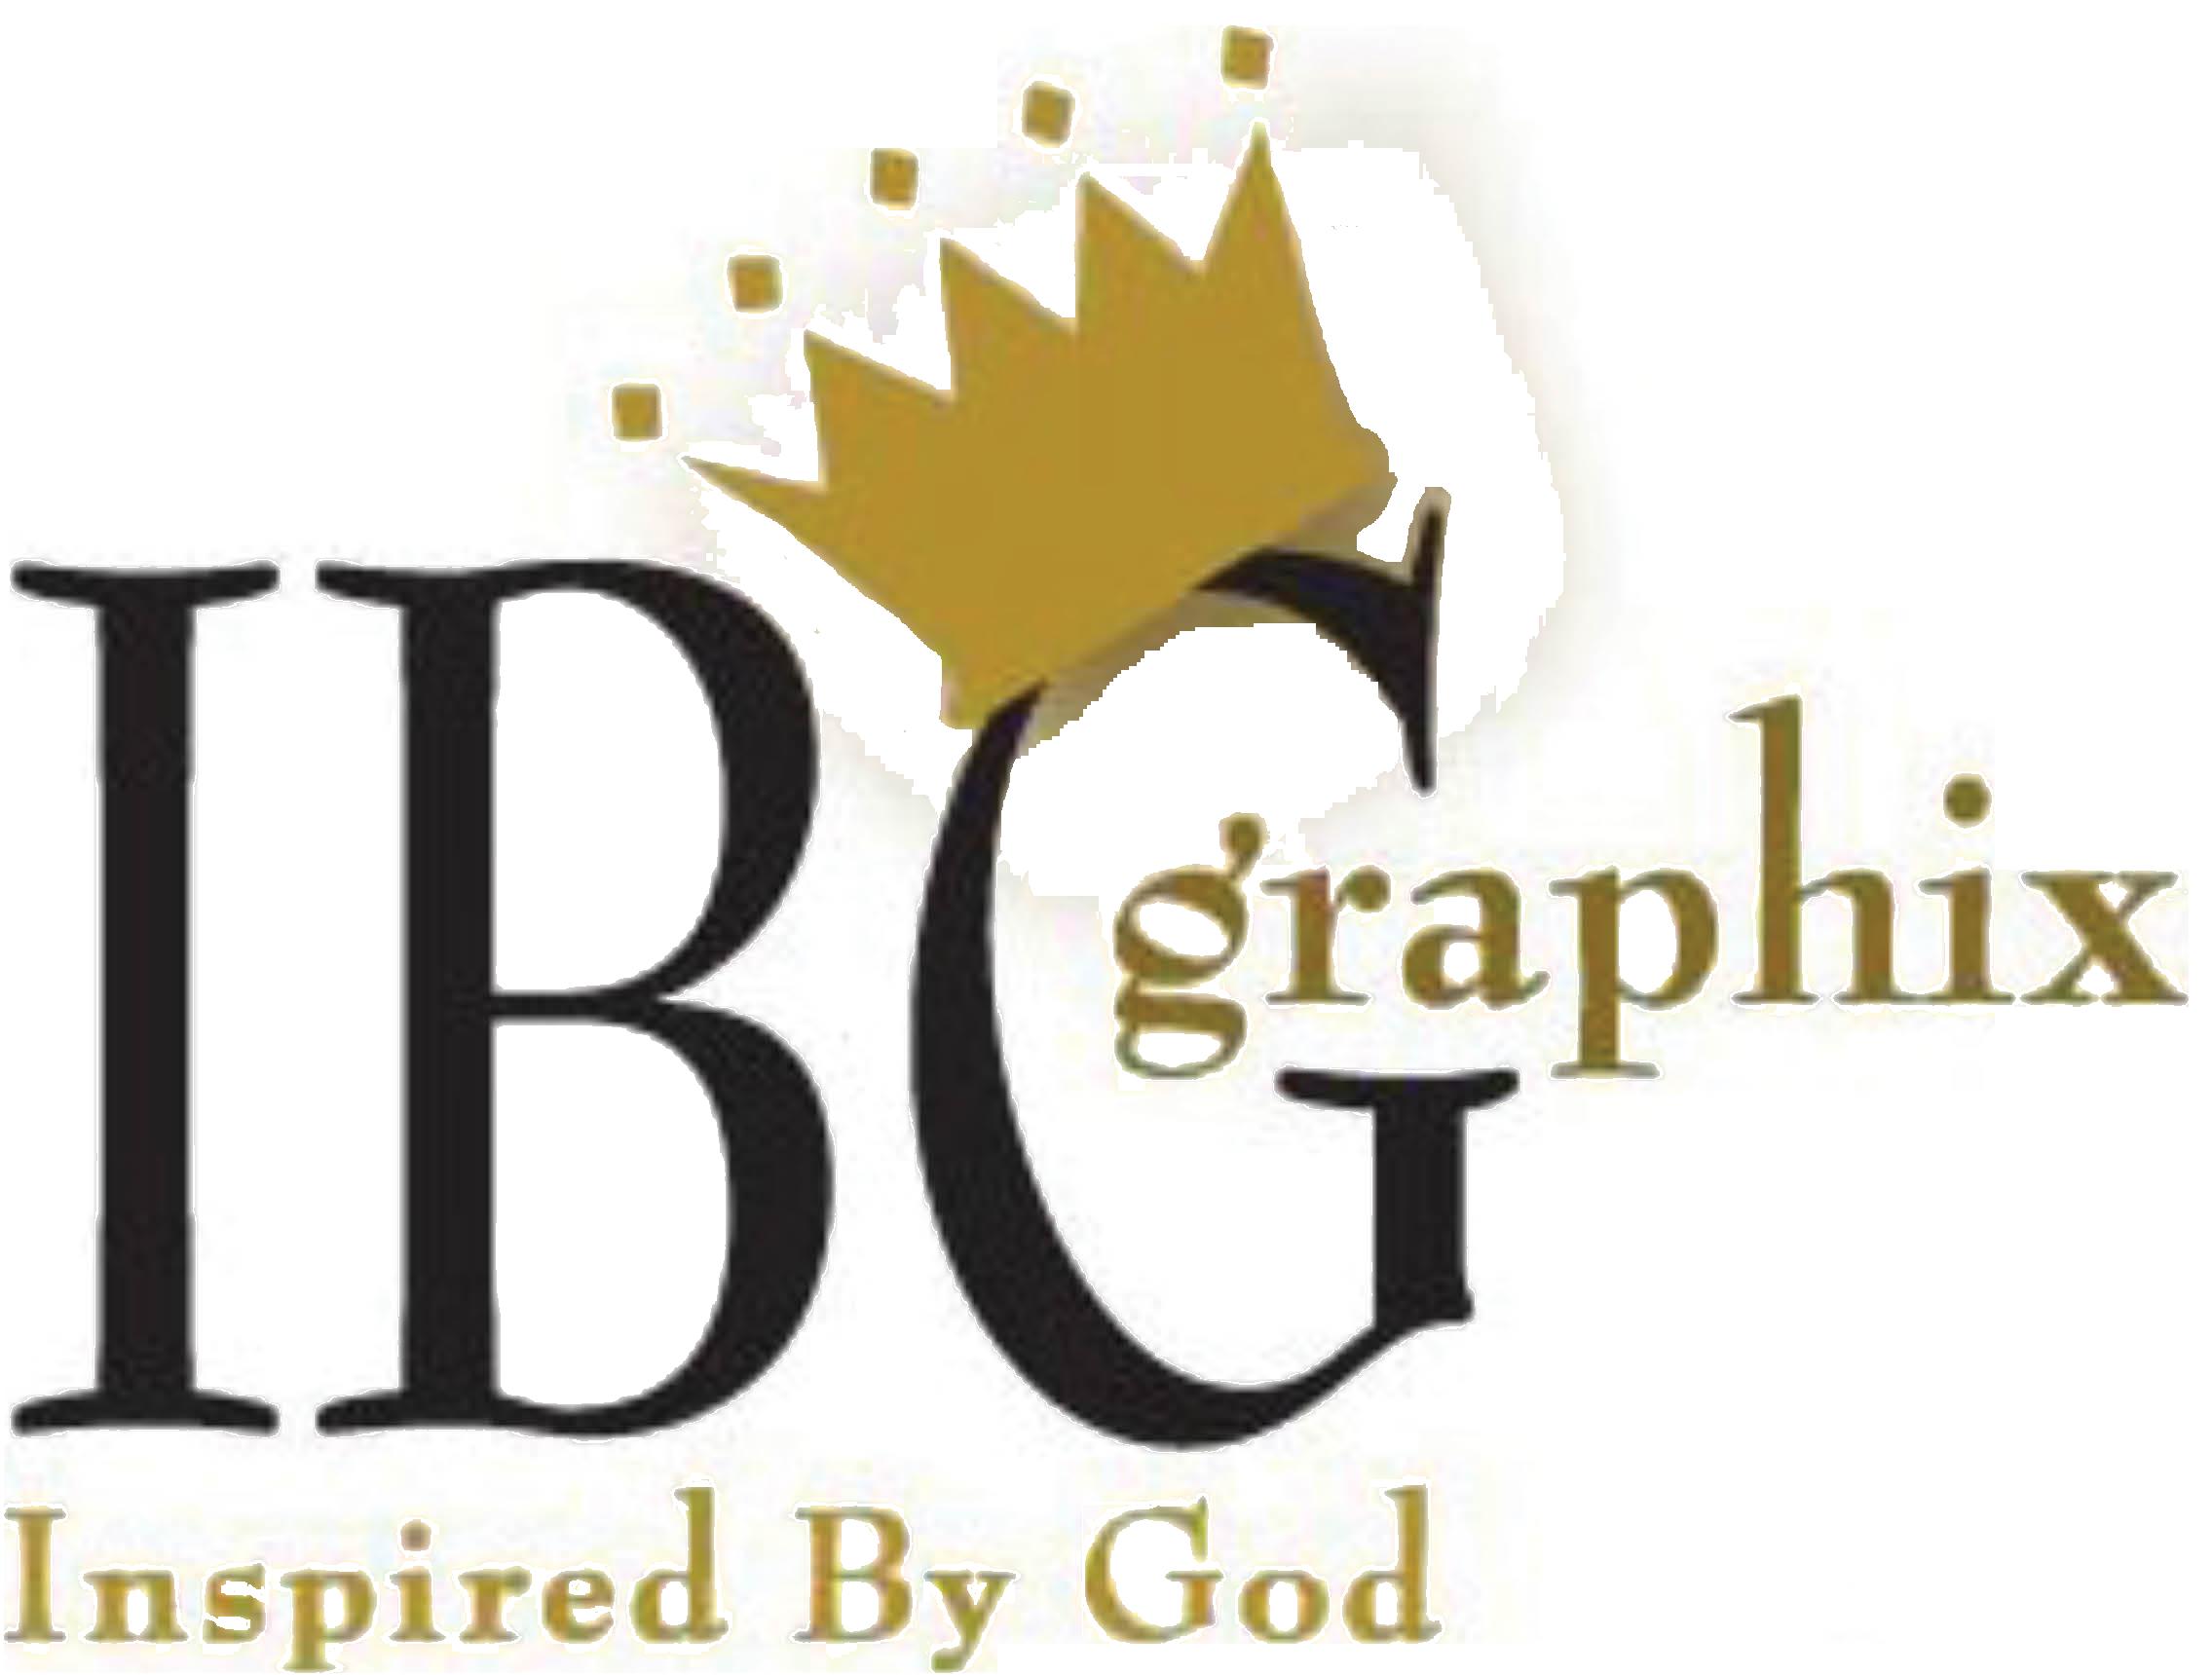 IBG Graphix